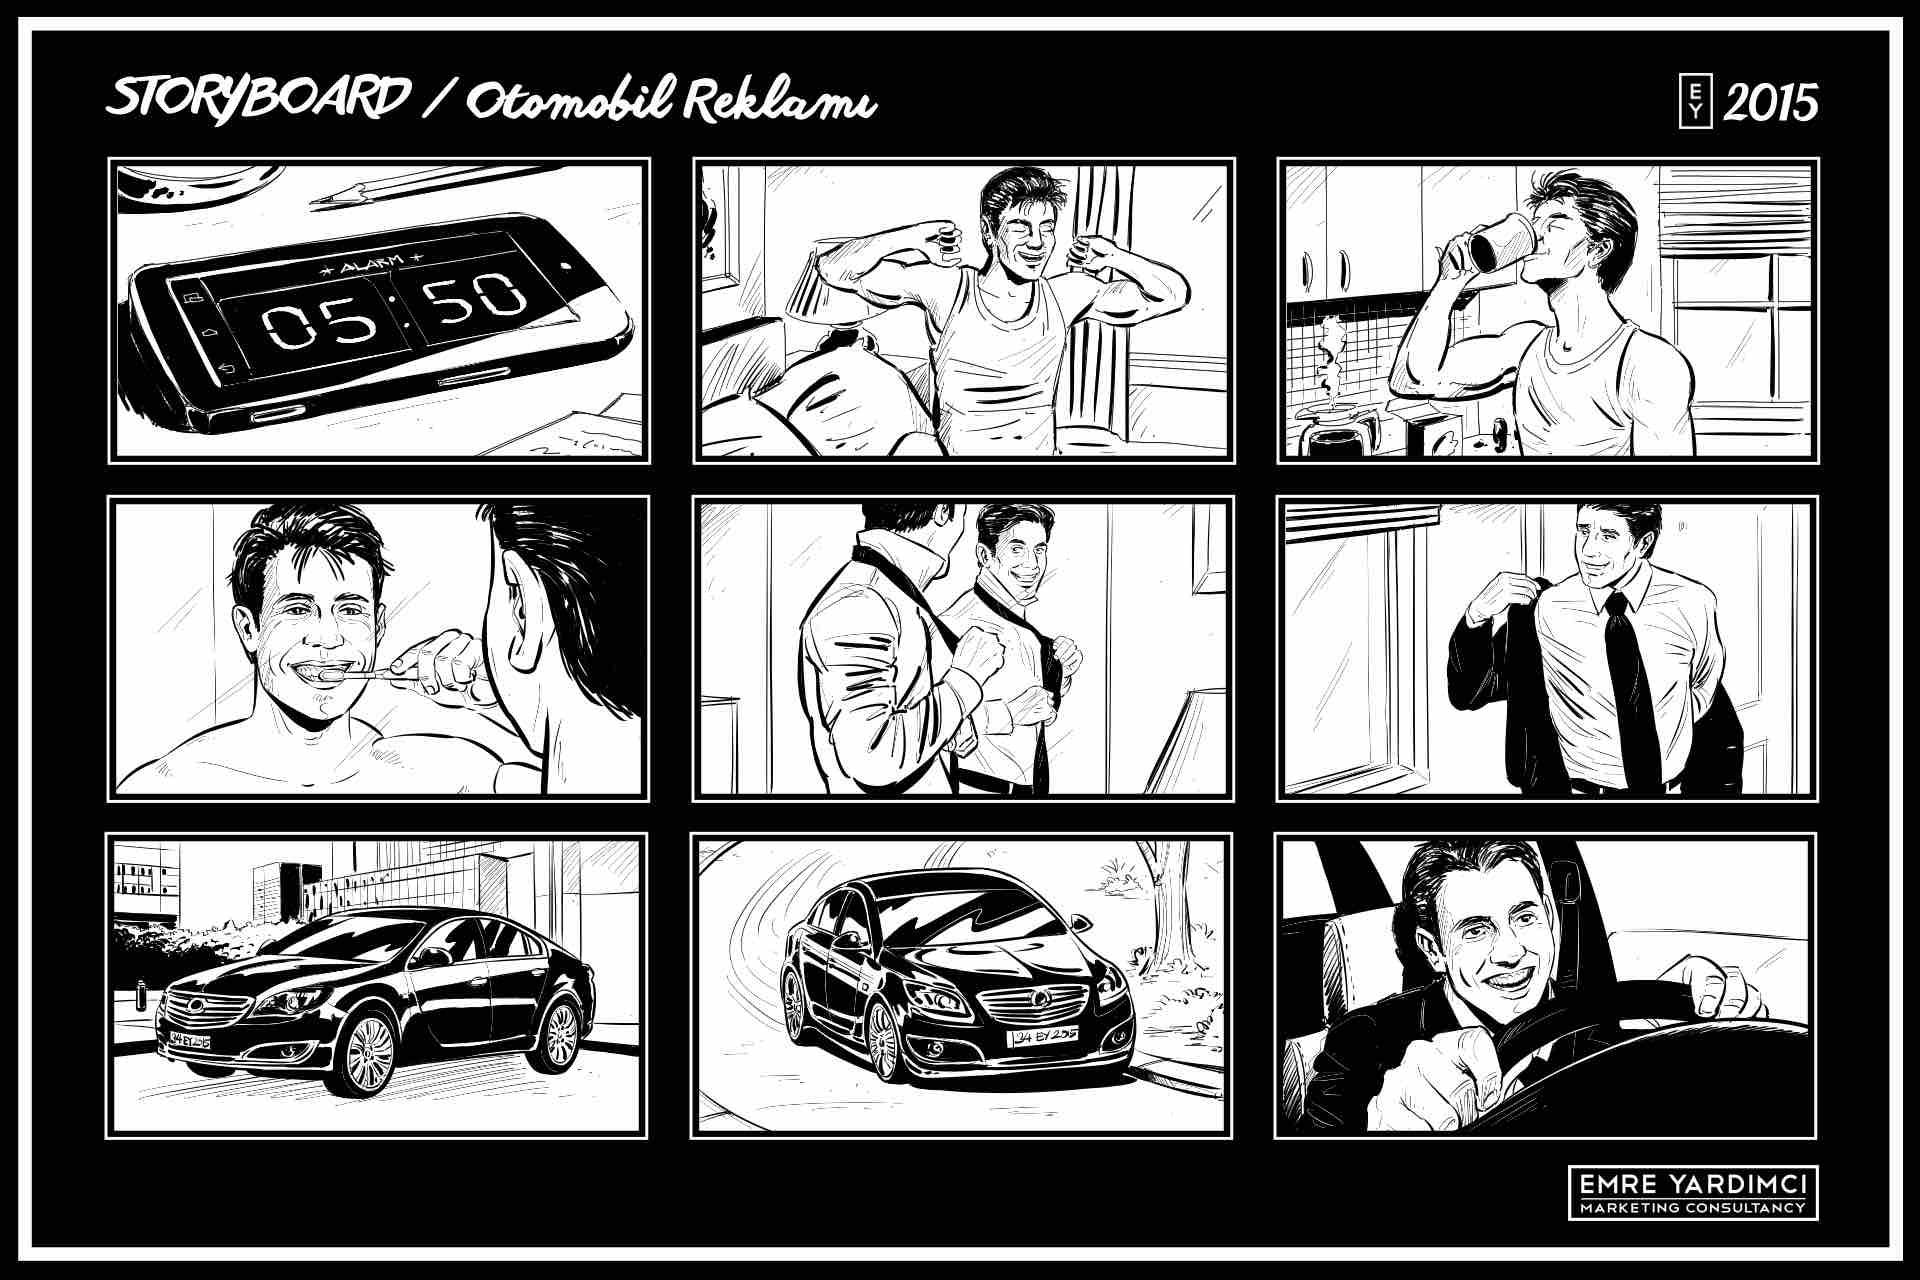 Otomobil-sb.jpg